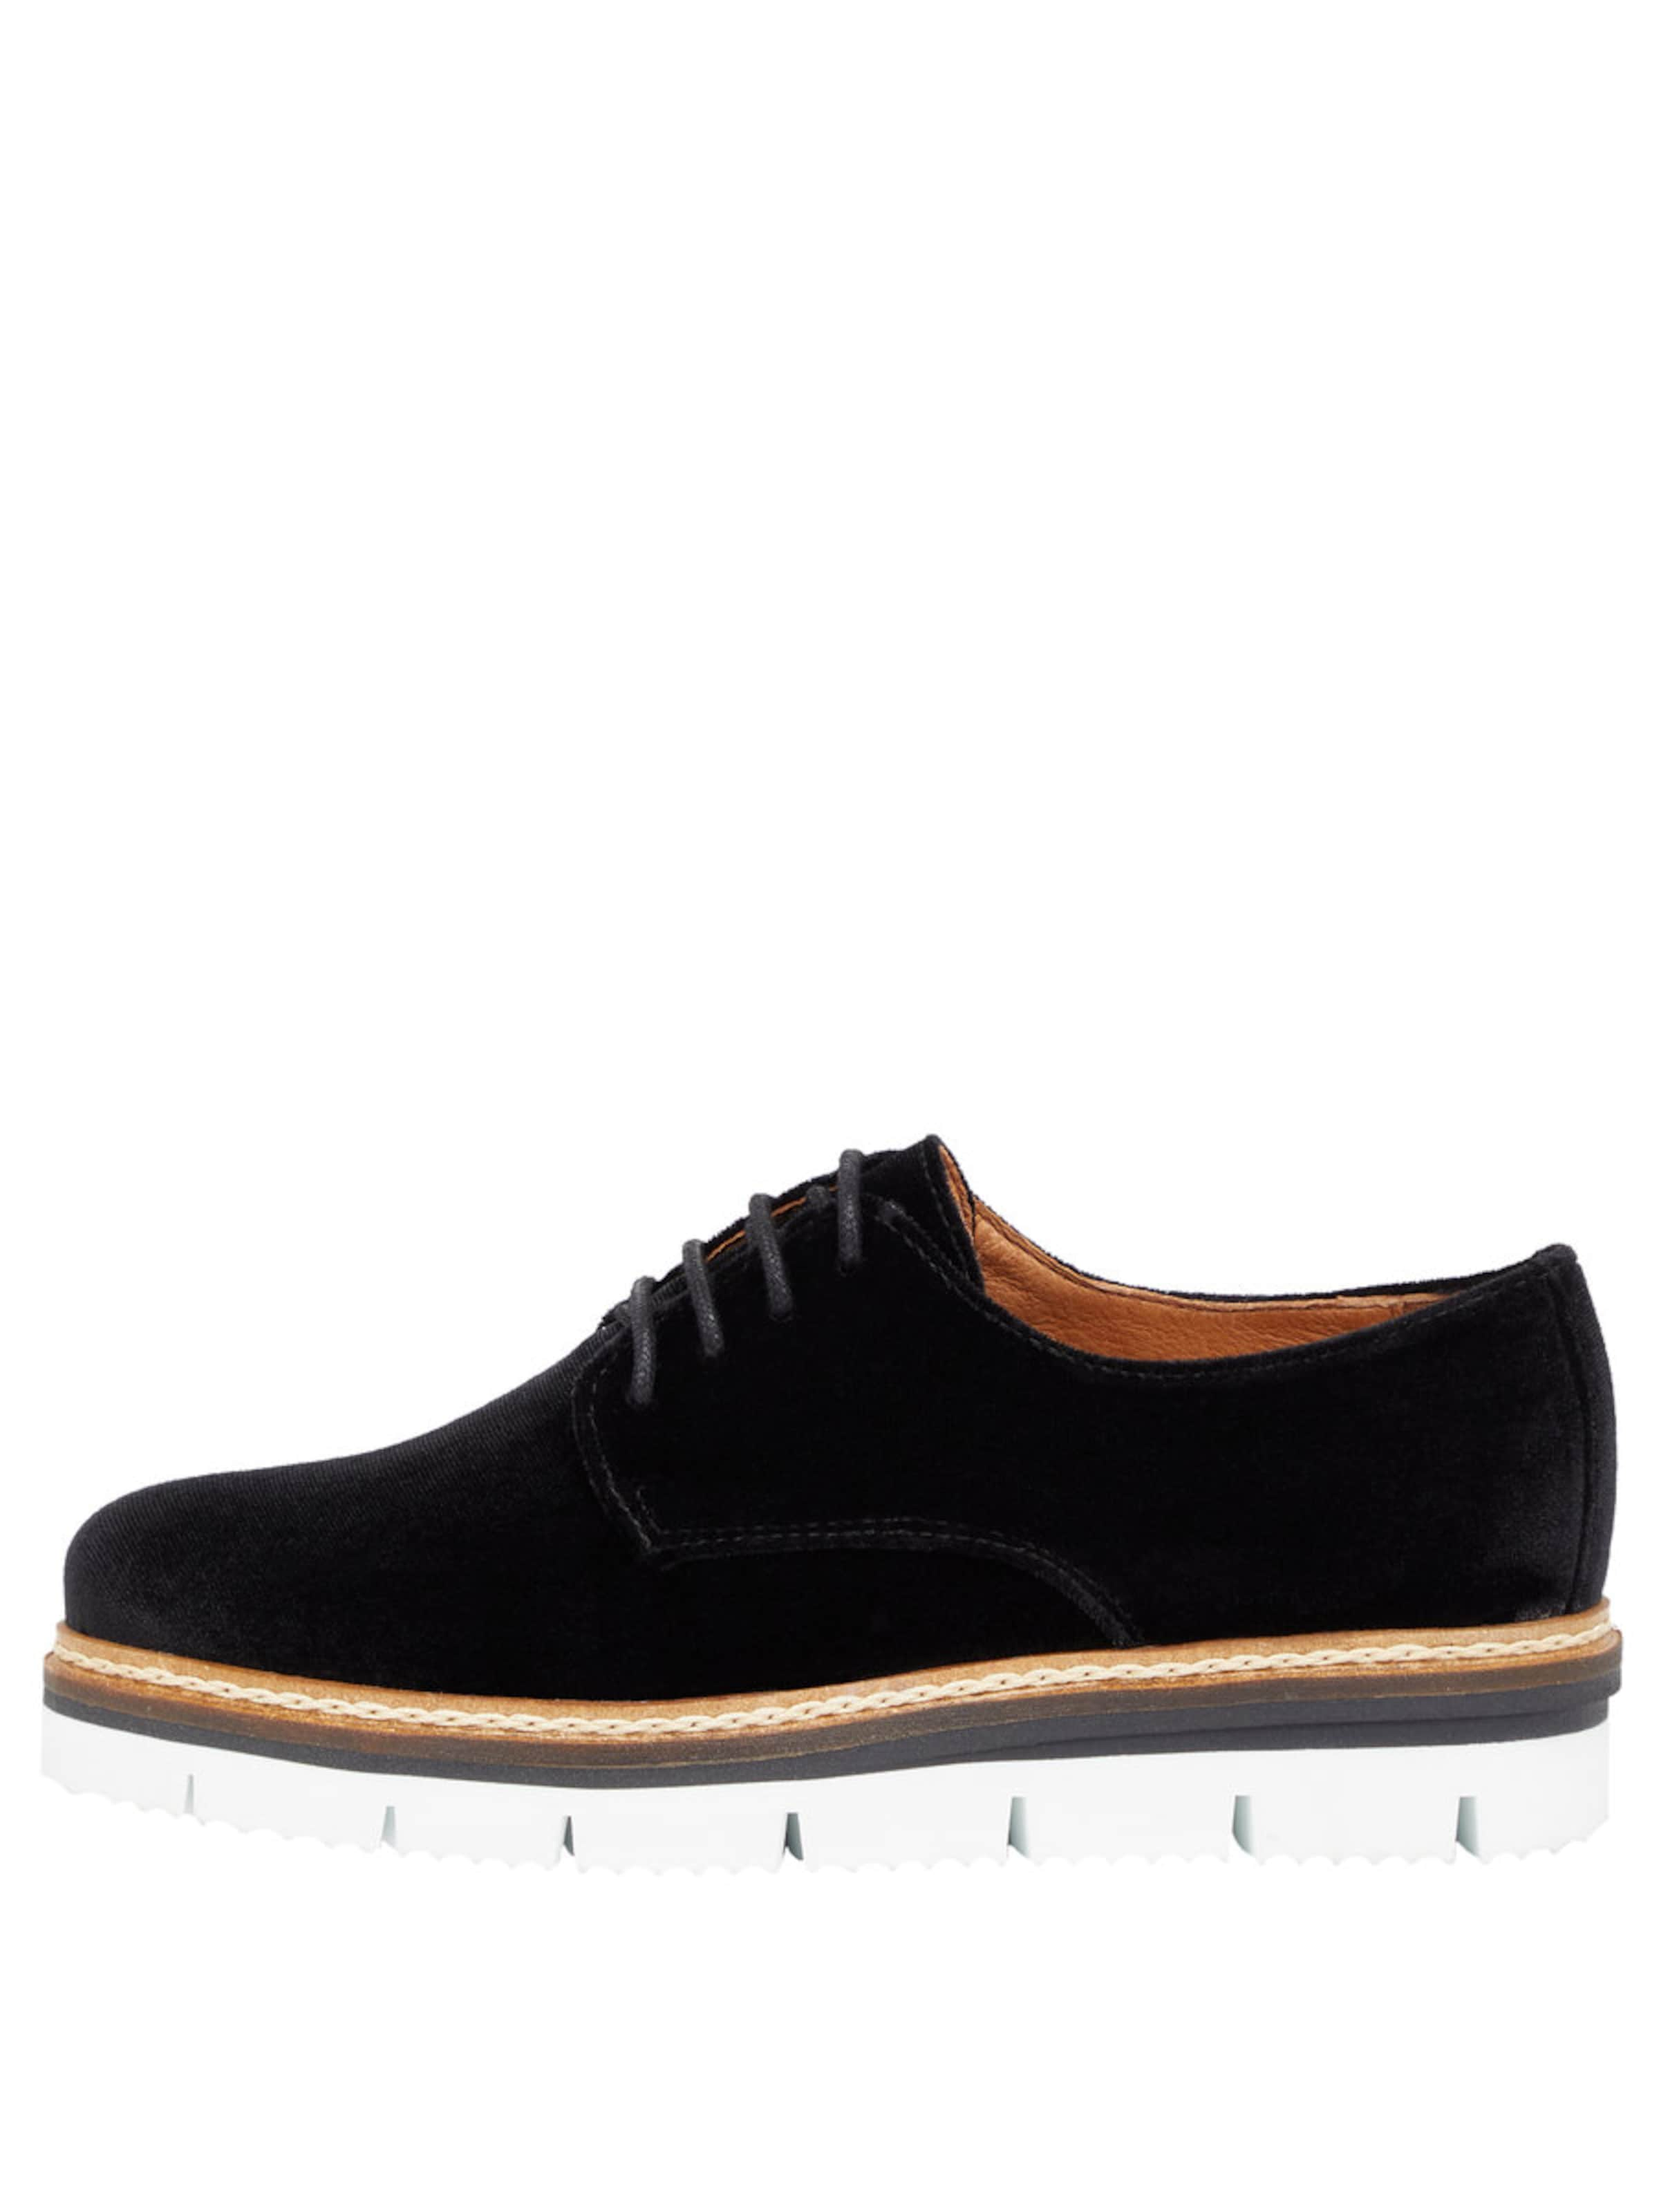 Bianco | Derby-Schuhe 'Cleaved Laced Up' Schuhe Gut getragene Schuhe